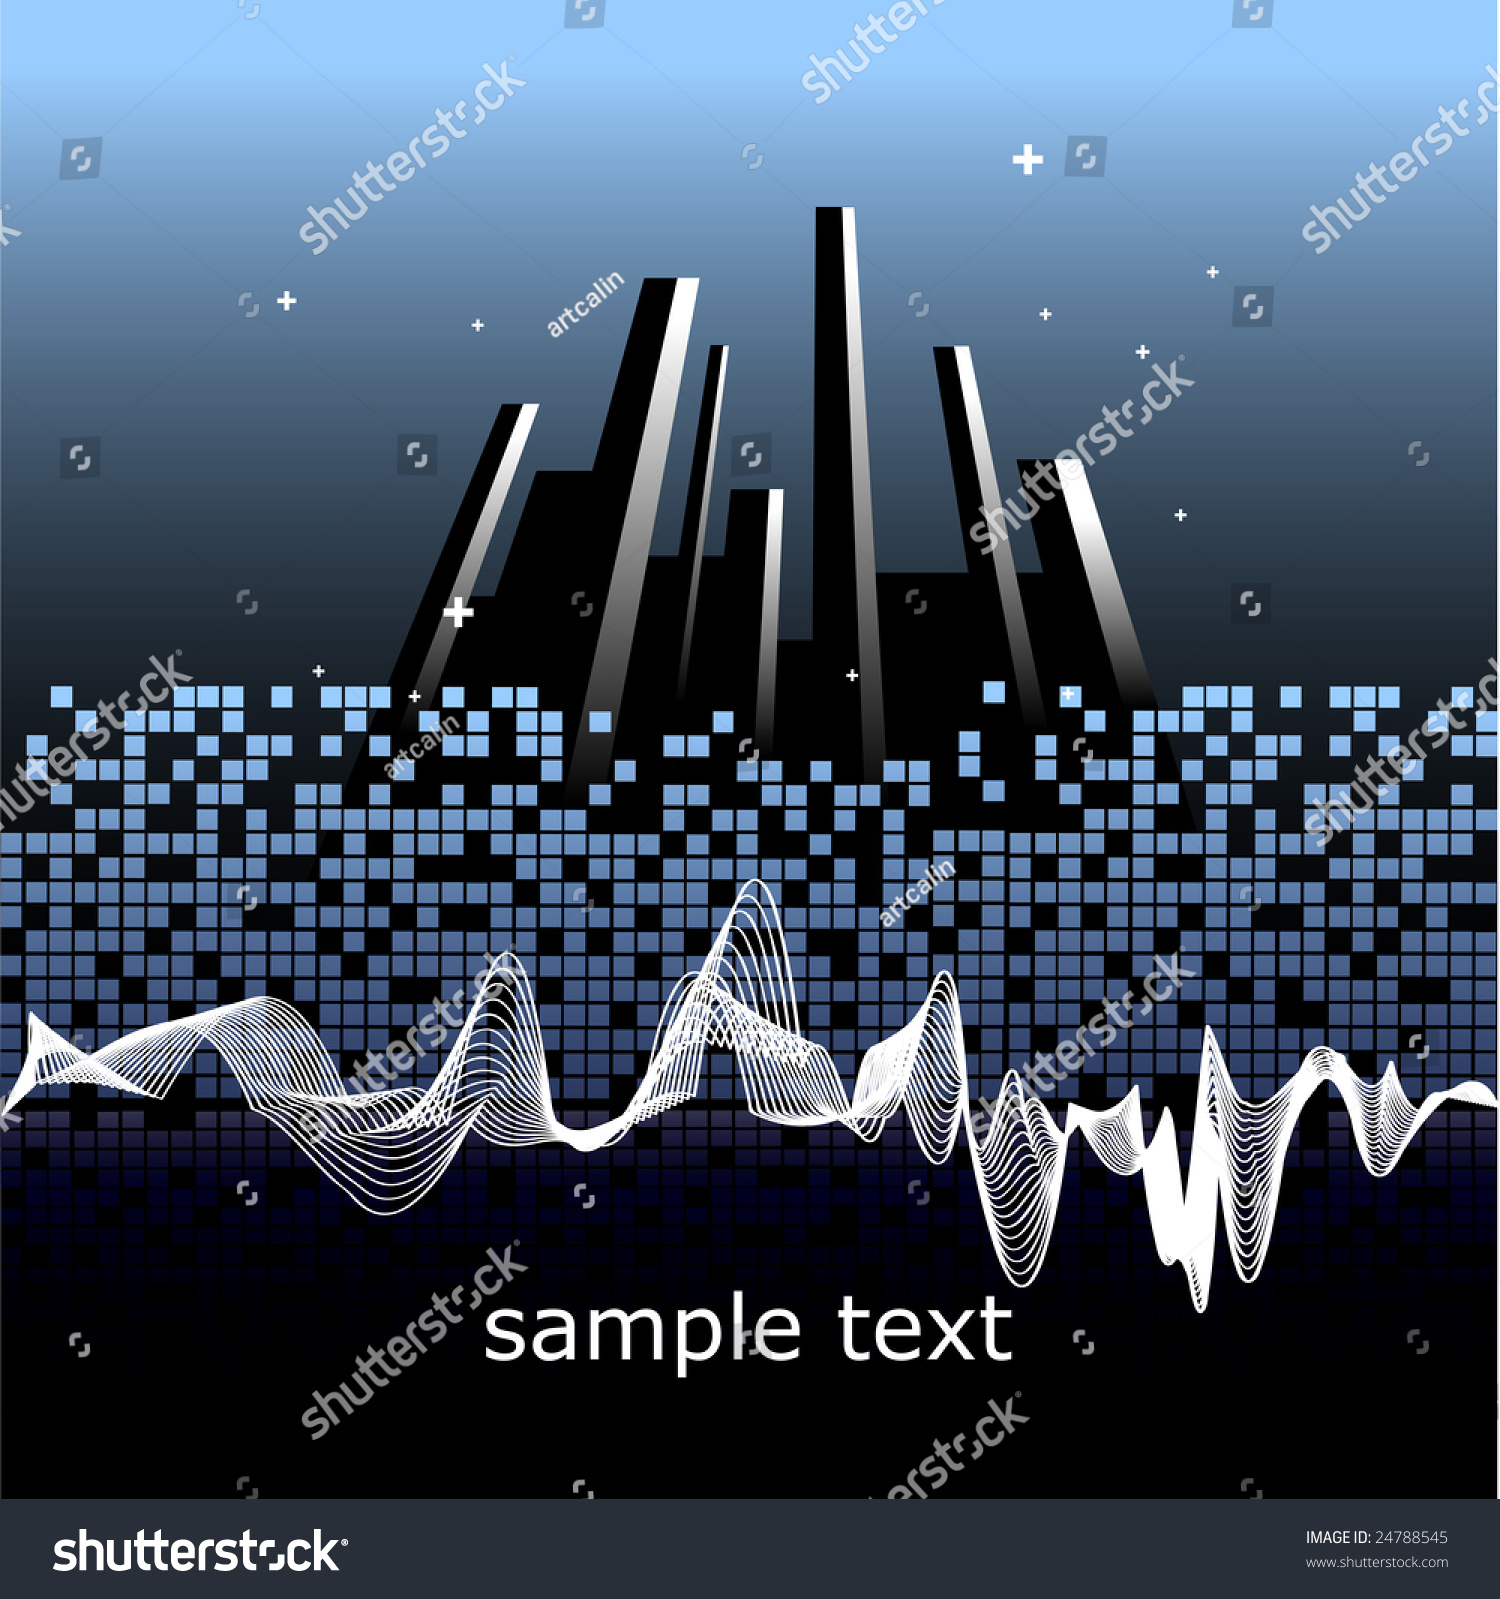 Wonderful Wallpaper Music Soundwave - stock-vector-hi-tech-vector-music-wallpaper-with-sound-waves-blue-colors-24788545  2018_518186.jpg